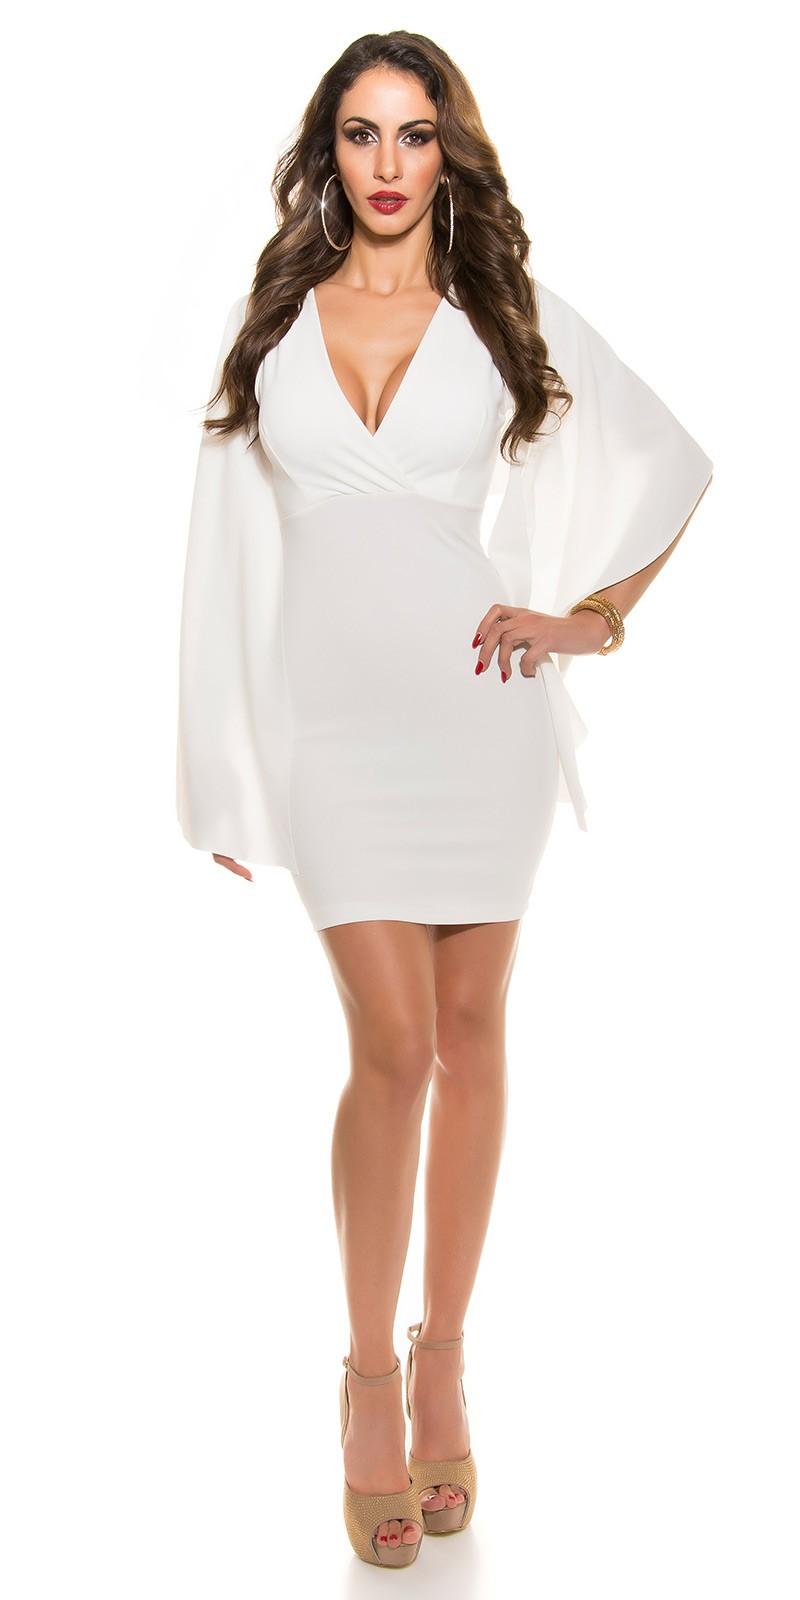 5125feff8e9a ooKouCla  Etui Kleid Katy P Look  Color WHITE Size L 0000K3393-5E WEISS 70  · Biele vecerne saty